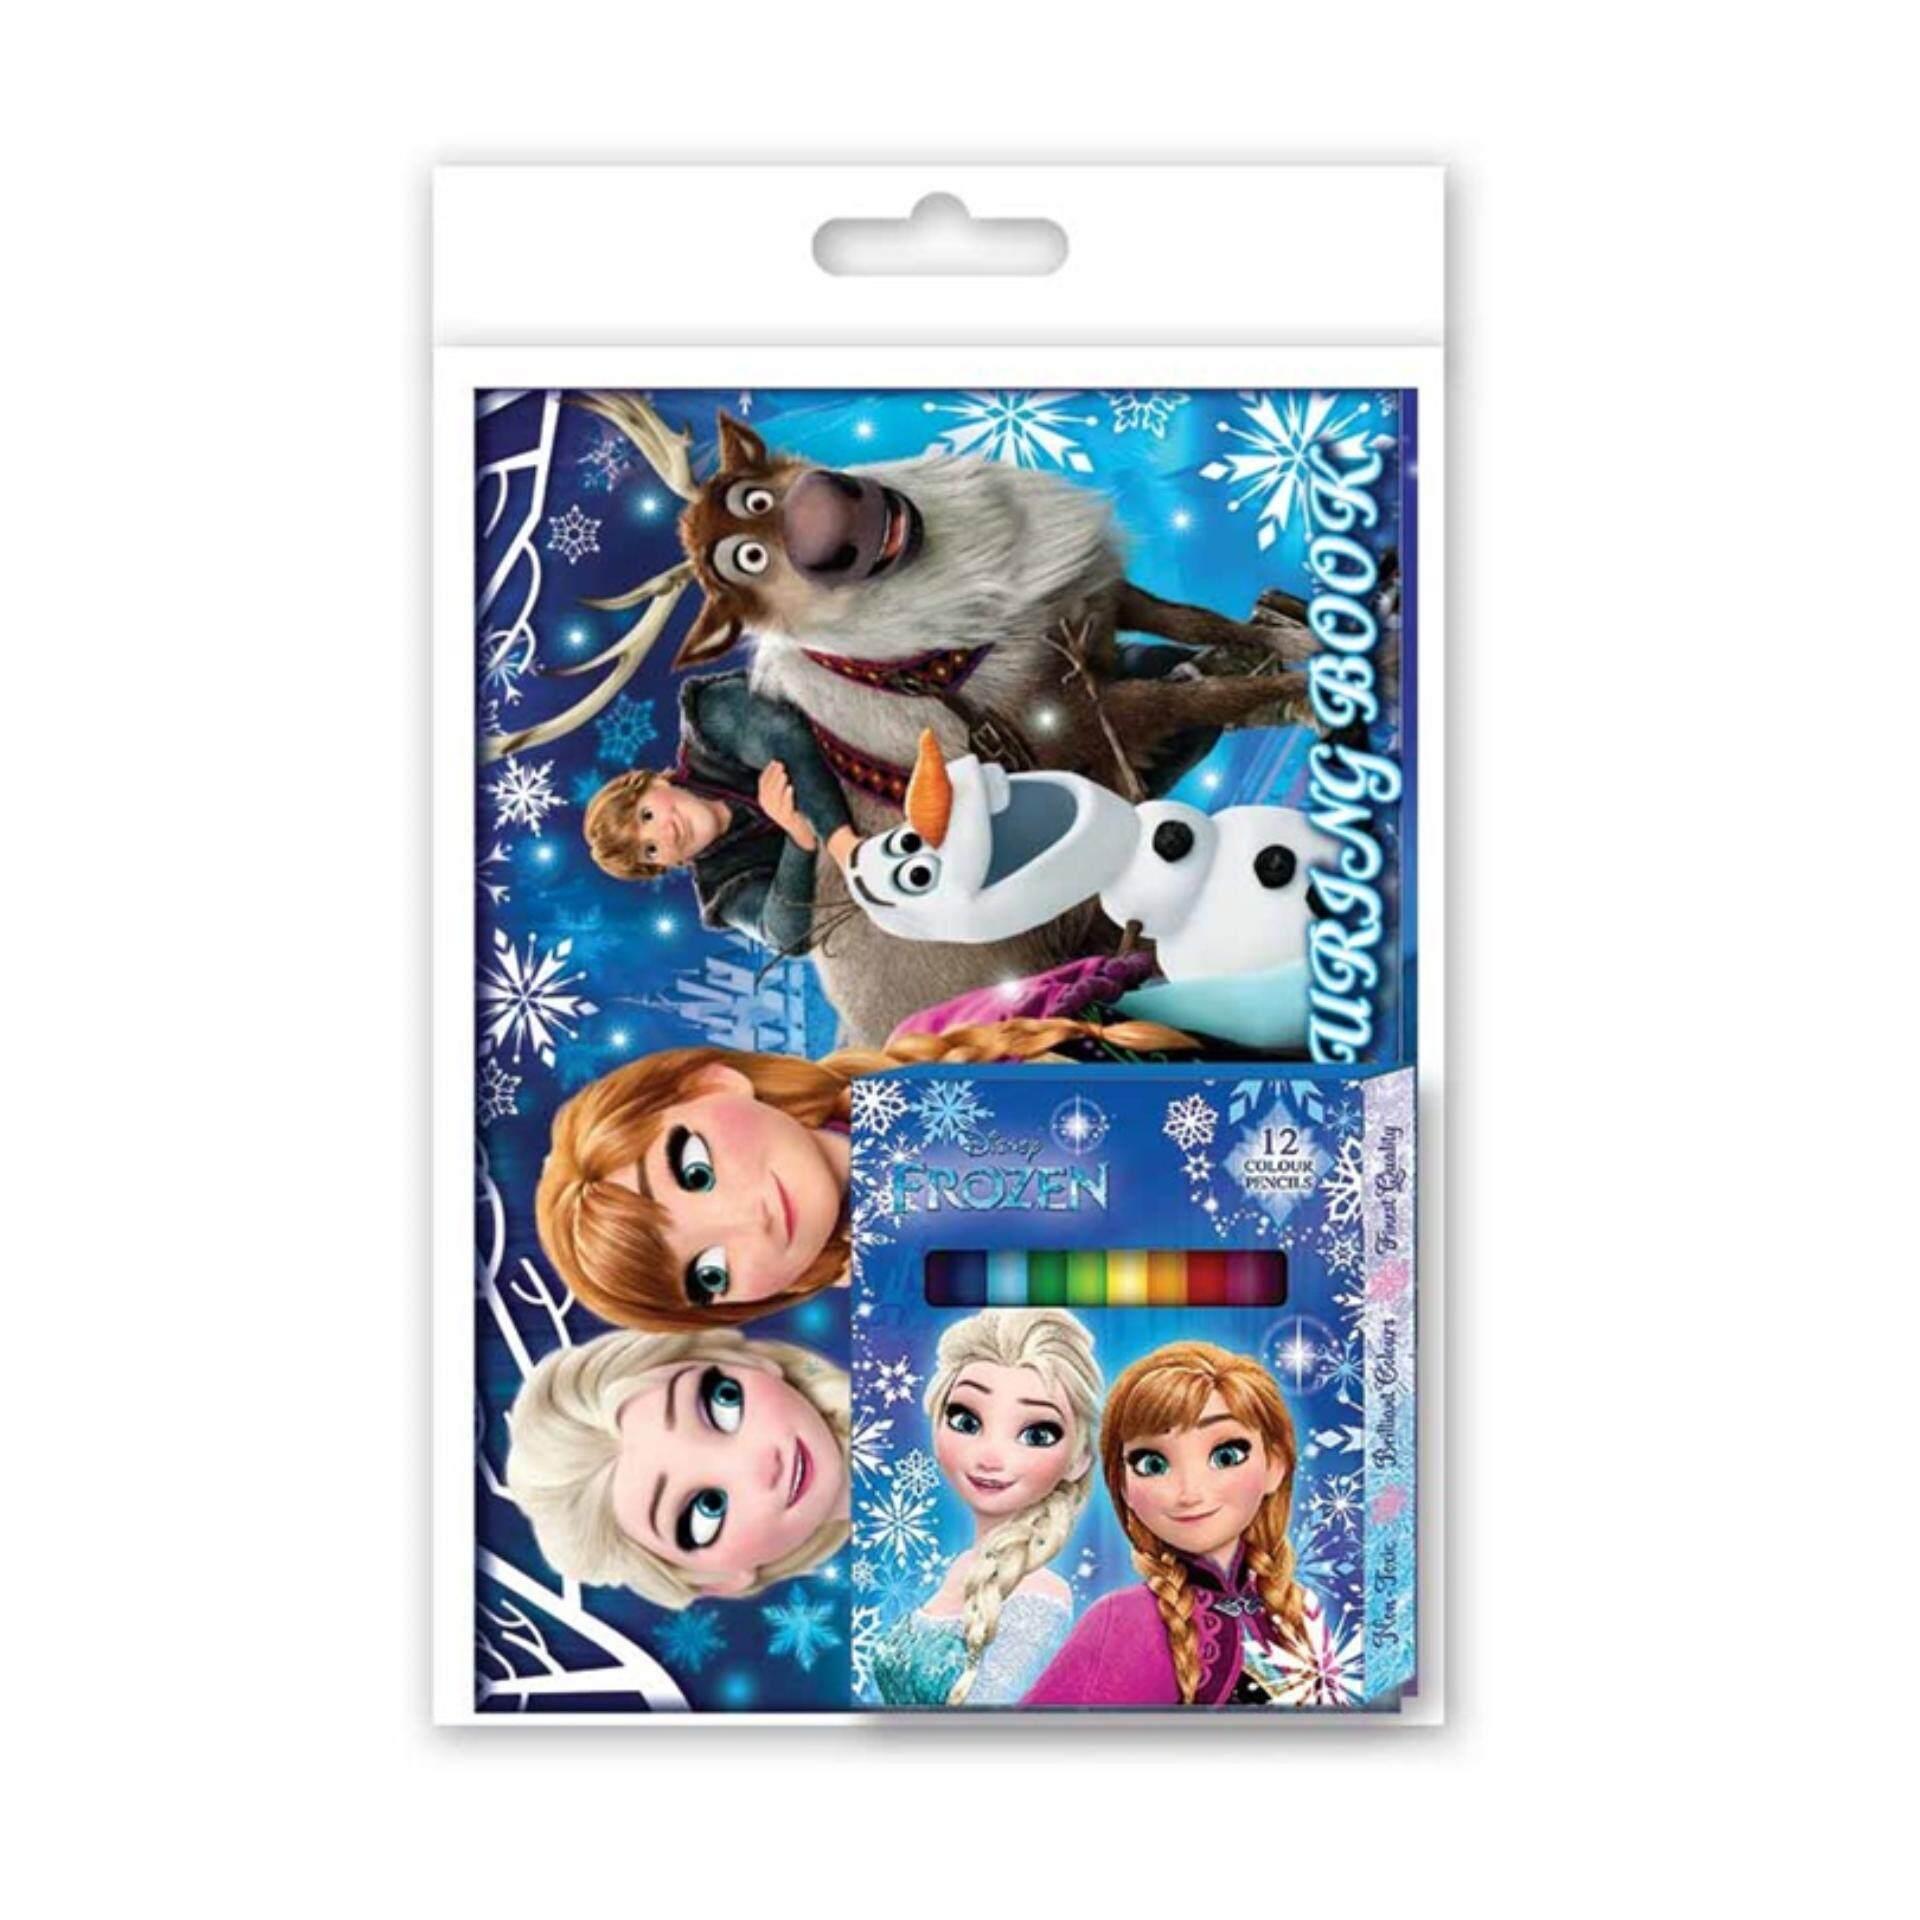 Disney Princess Frozen Activity & Colouring With Sticker - Blue Colour